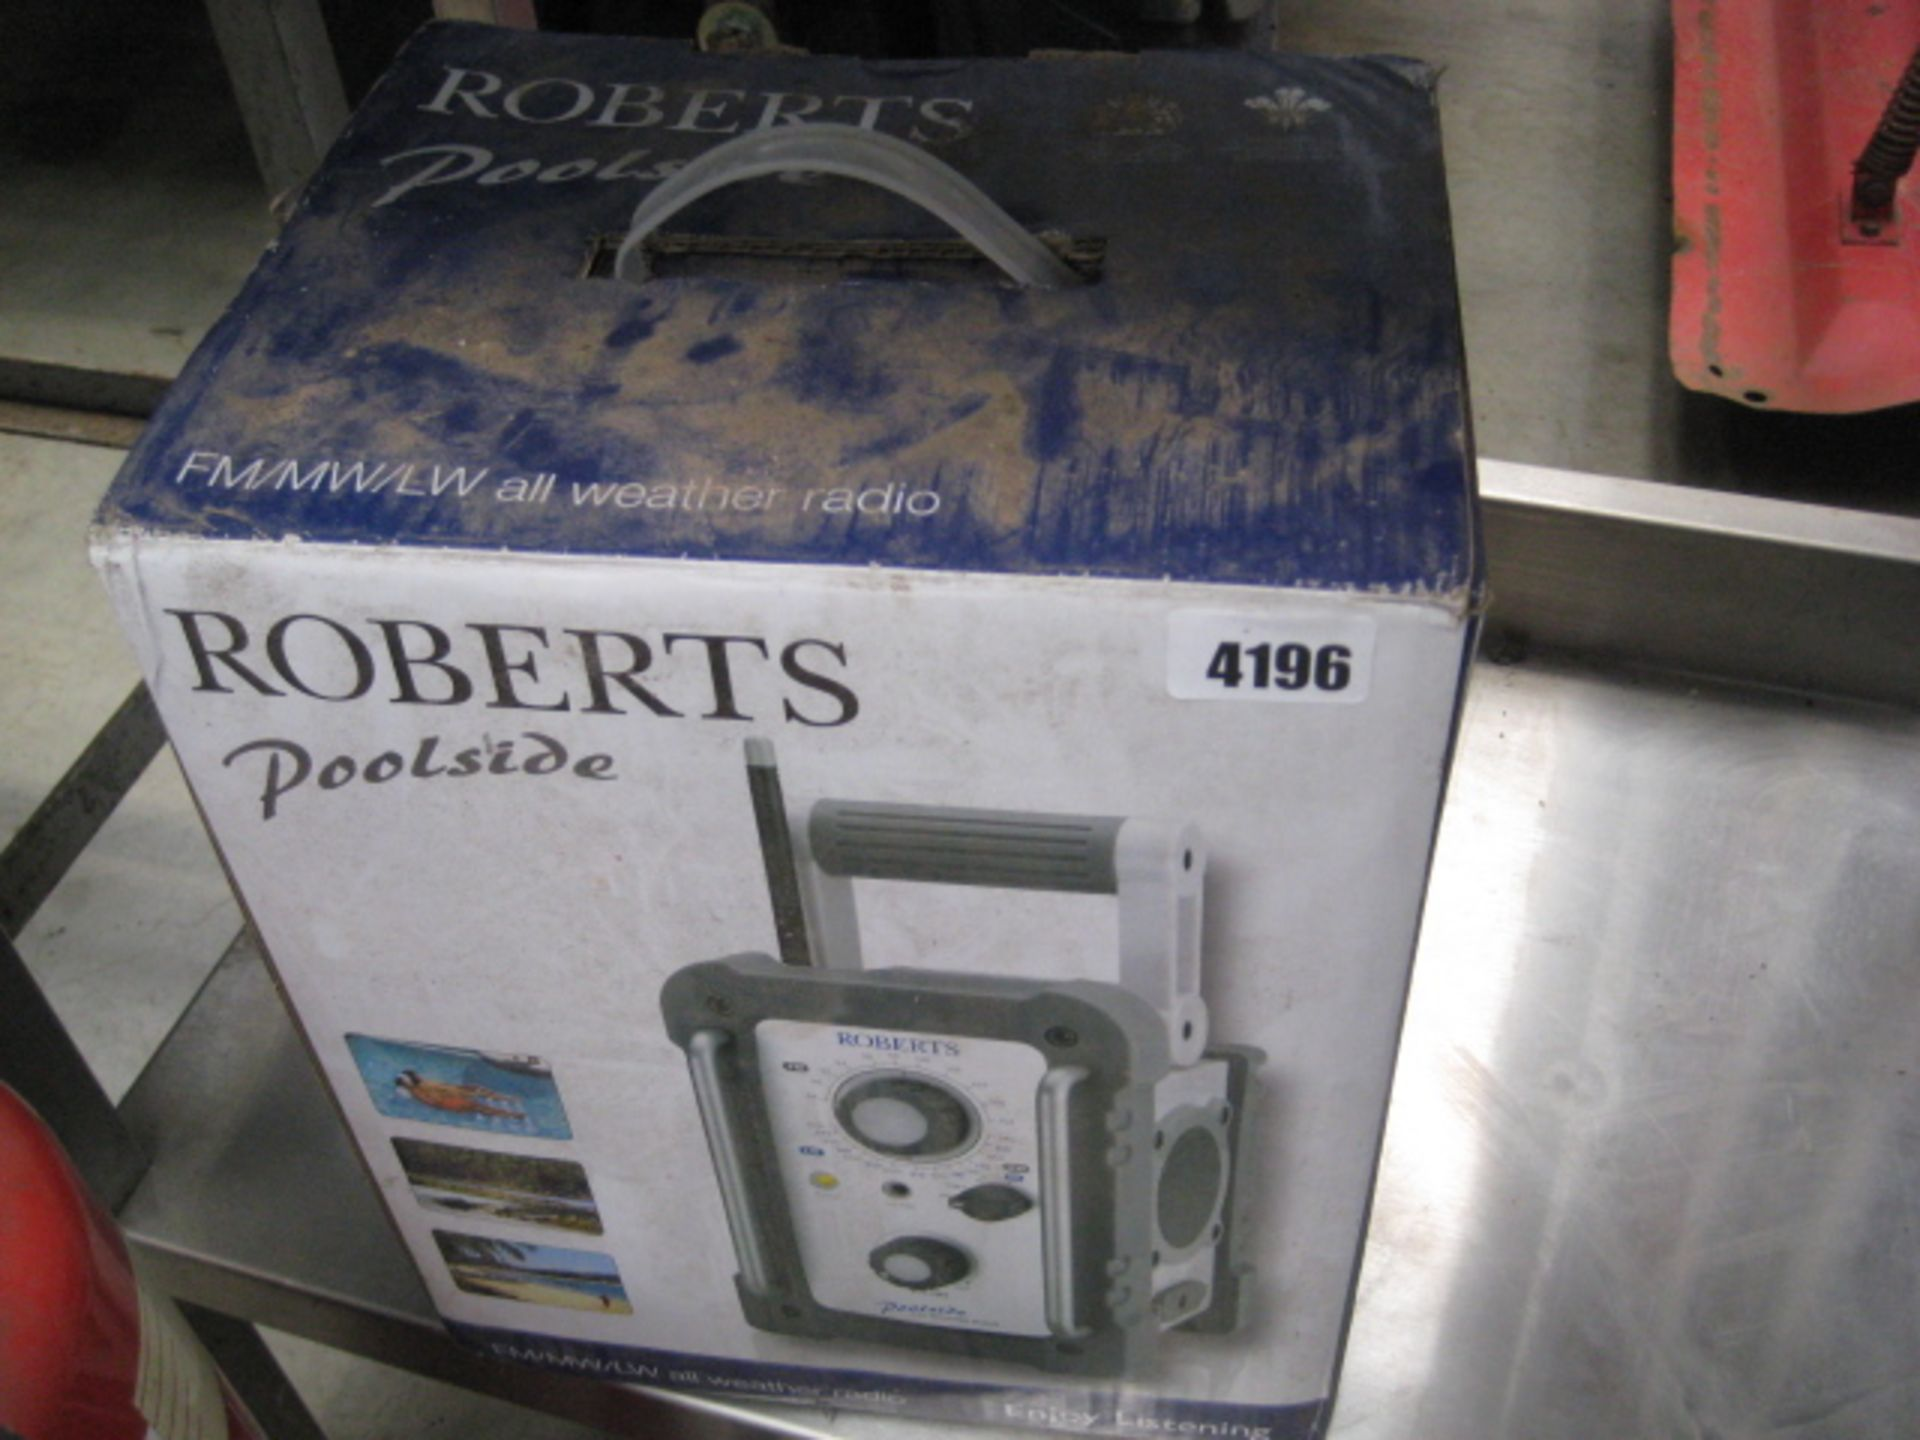 Lot 4196 - Roberts poolside radio in box